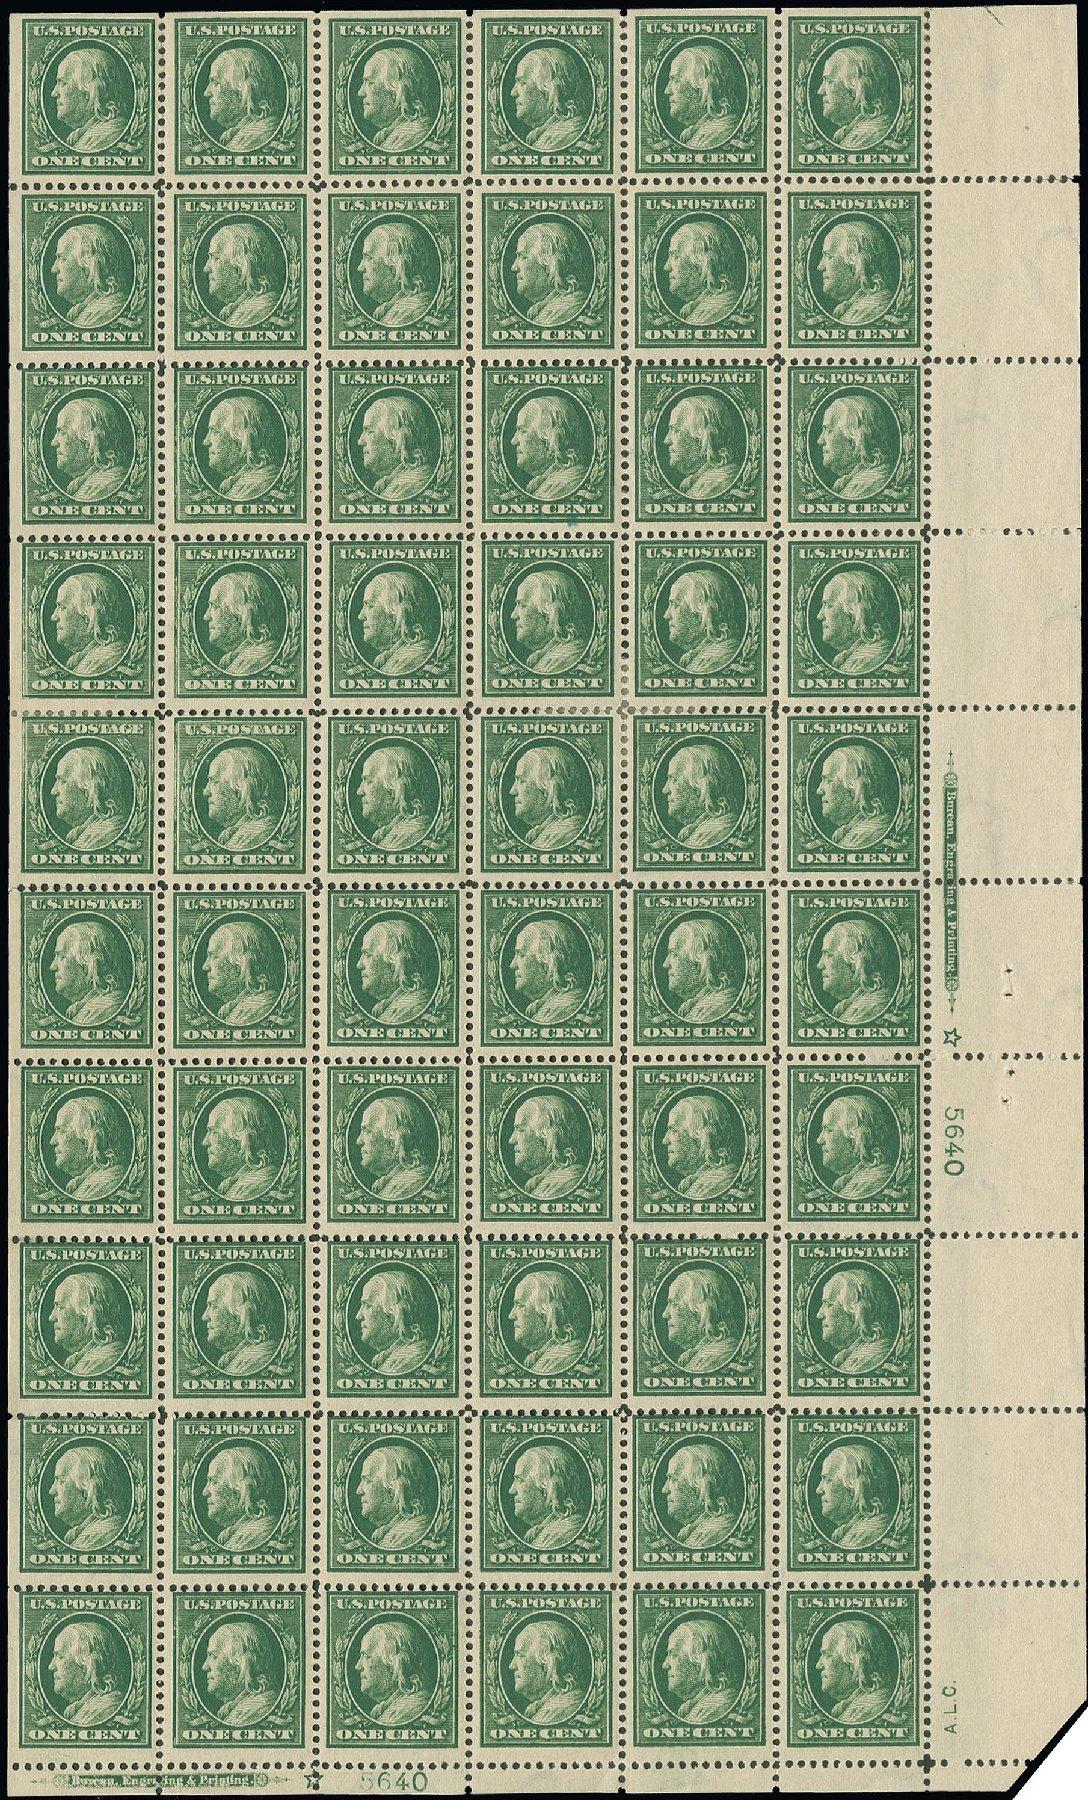 US Stamp Values Scott # 374 - 1c 1910 Franklin Perf 12. H.R. Harmer, Oct 2014, Sale 3006, Lot 1339